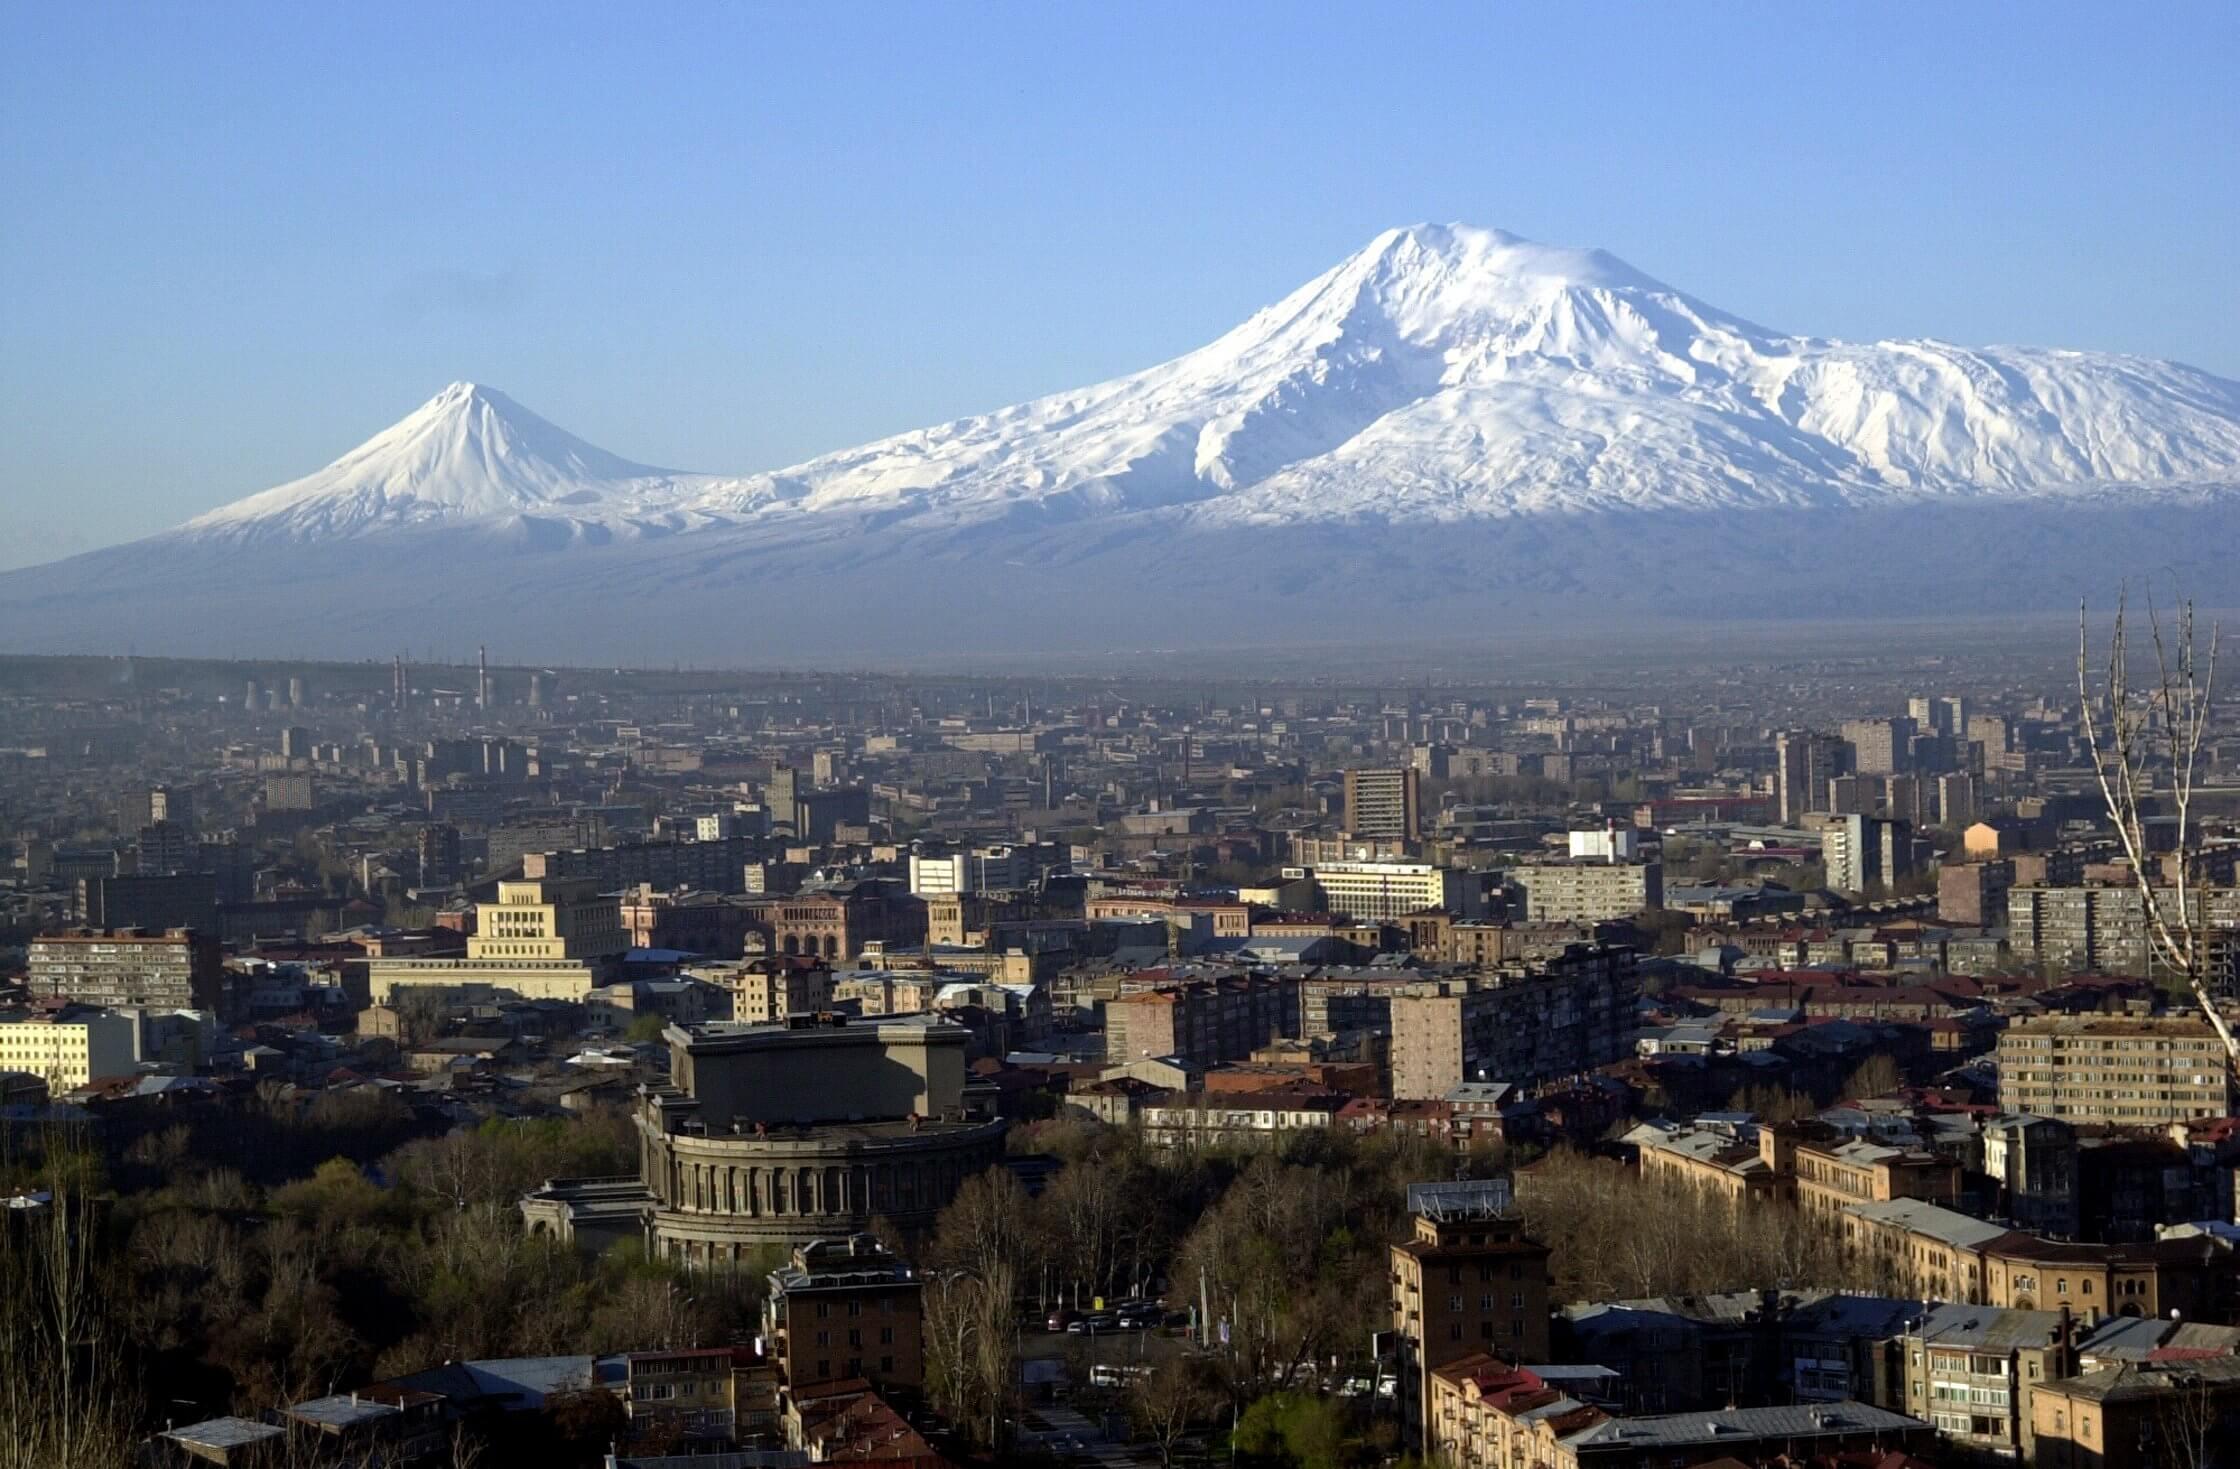 Землетрясение произошло в Армении